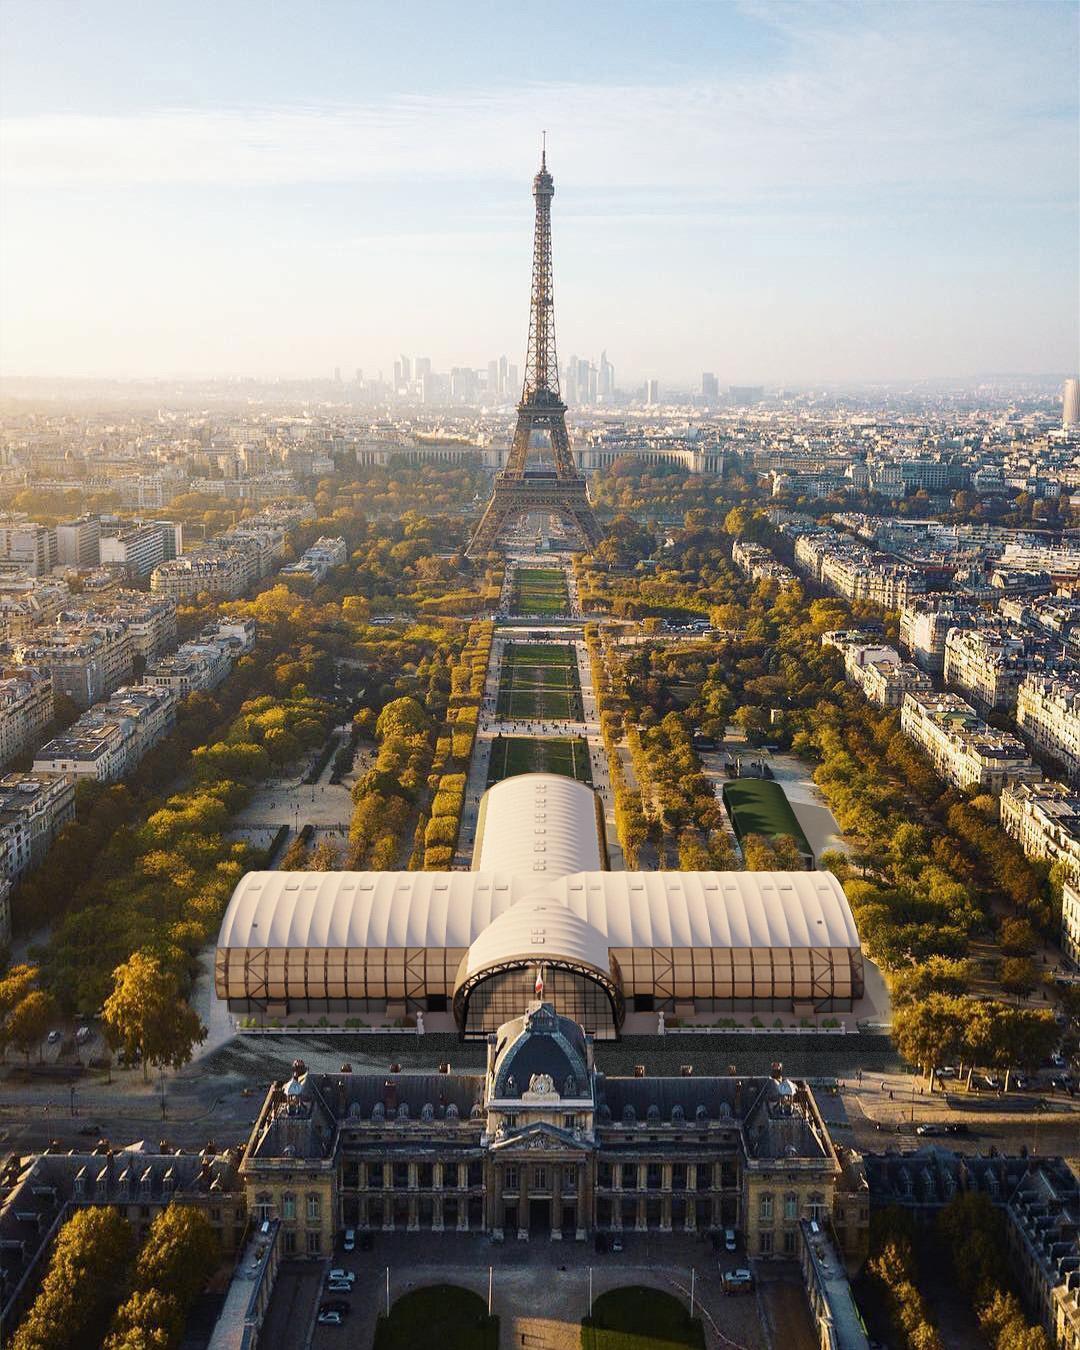 The Grand Palais Ephémère (Temporary Grand Palais) © Wilmotte & Associés